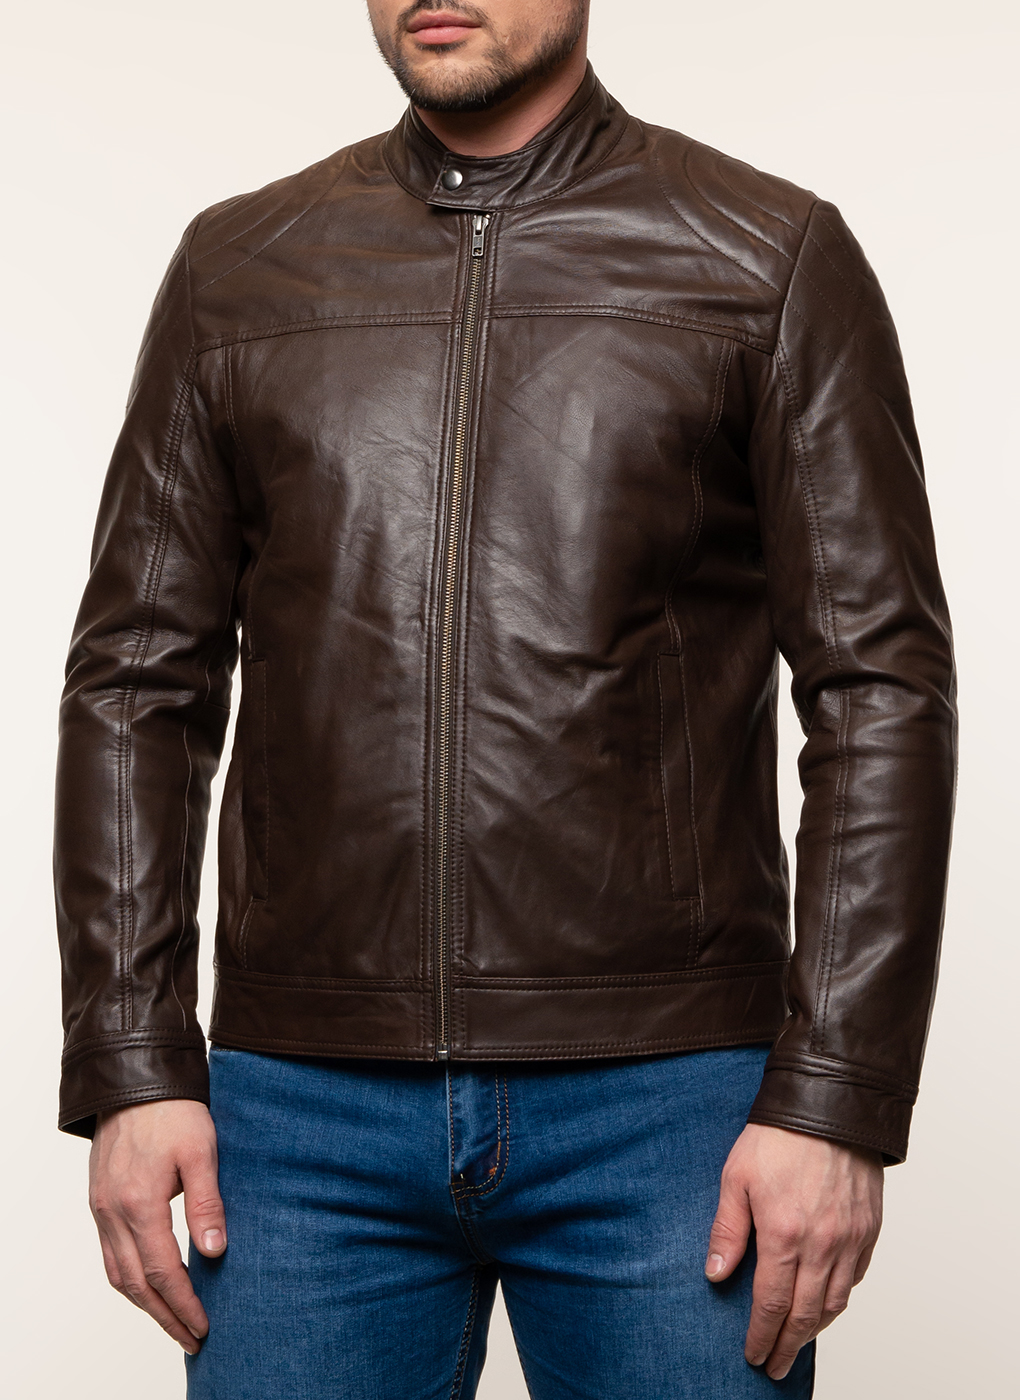 Кожаная куртка мужская 19, Gotthold фото